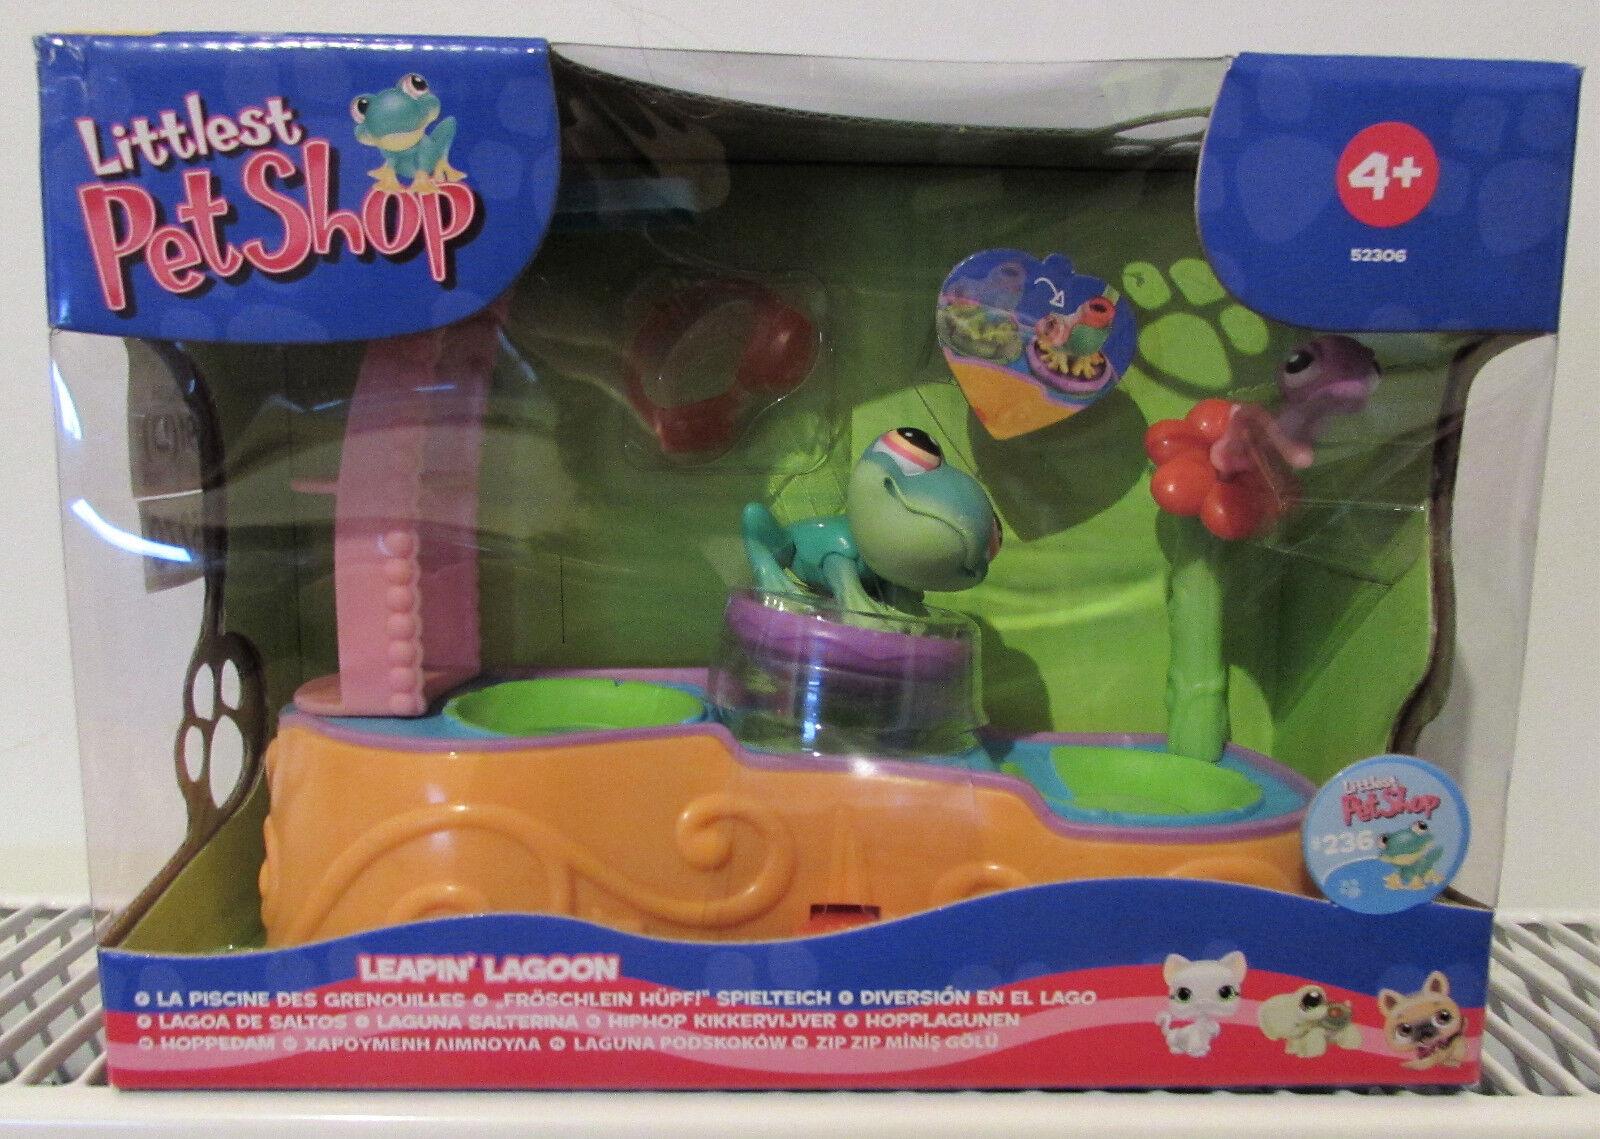 Littlest Pet Shop Leapin' Lagoon Play Set Green Frog BNIB